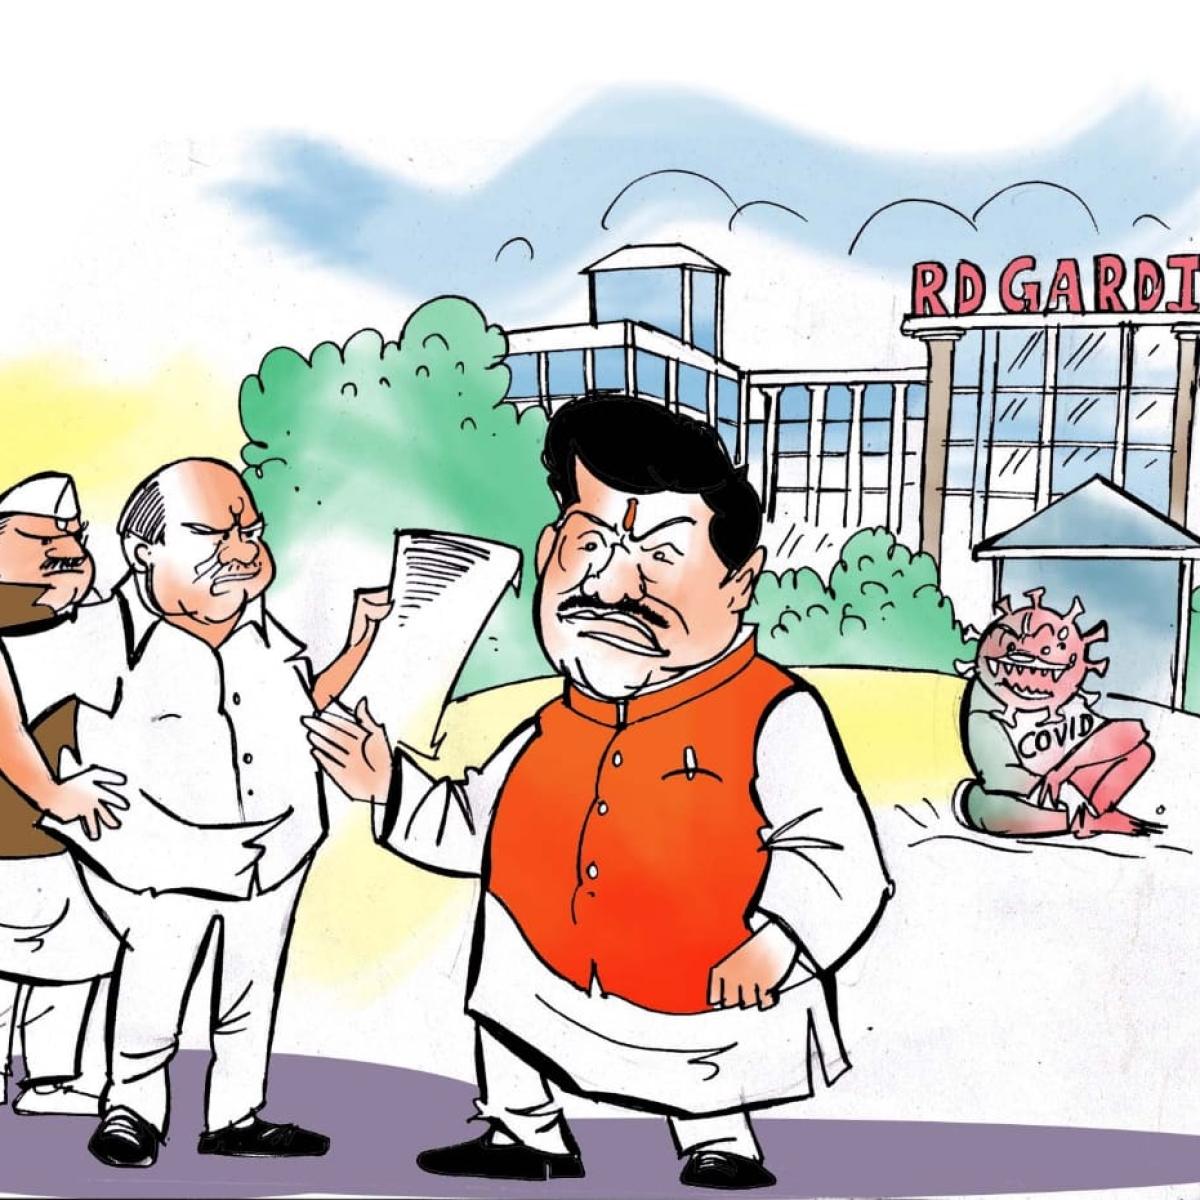 Free Press Expose: BJP wallas shun their own MP Anil Firojia for raking RD Gardi Medical College mess